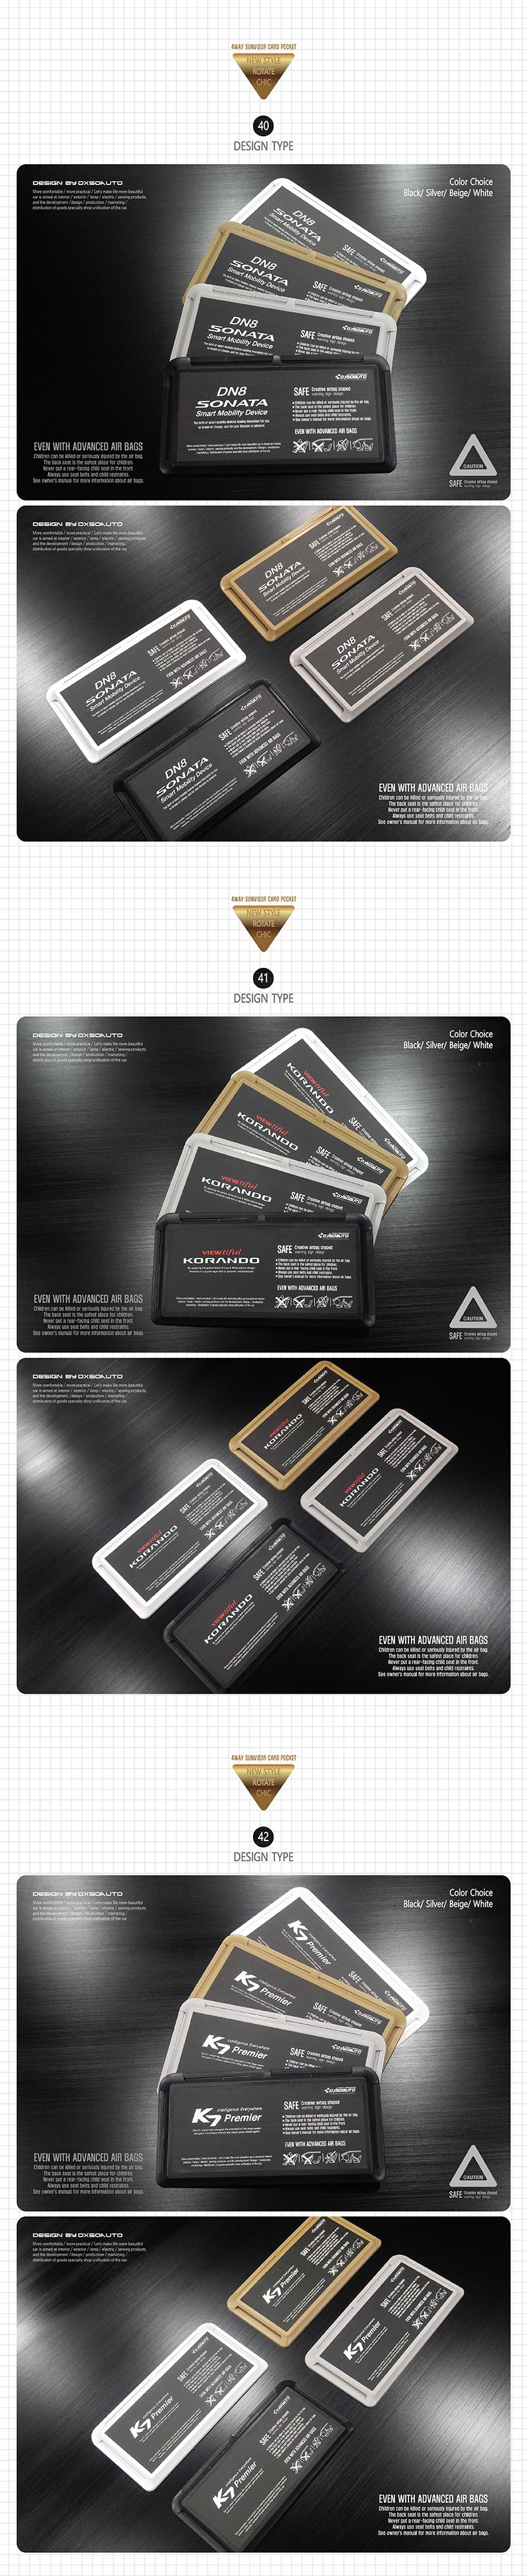 [DXSOAUTO] 커스터마이징 4WAY 썬바이저 카드포켓 (1EA / 1SET) K7 프리미어